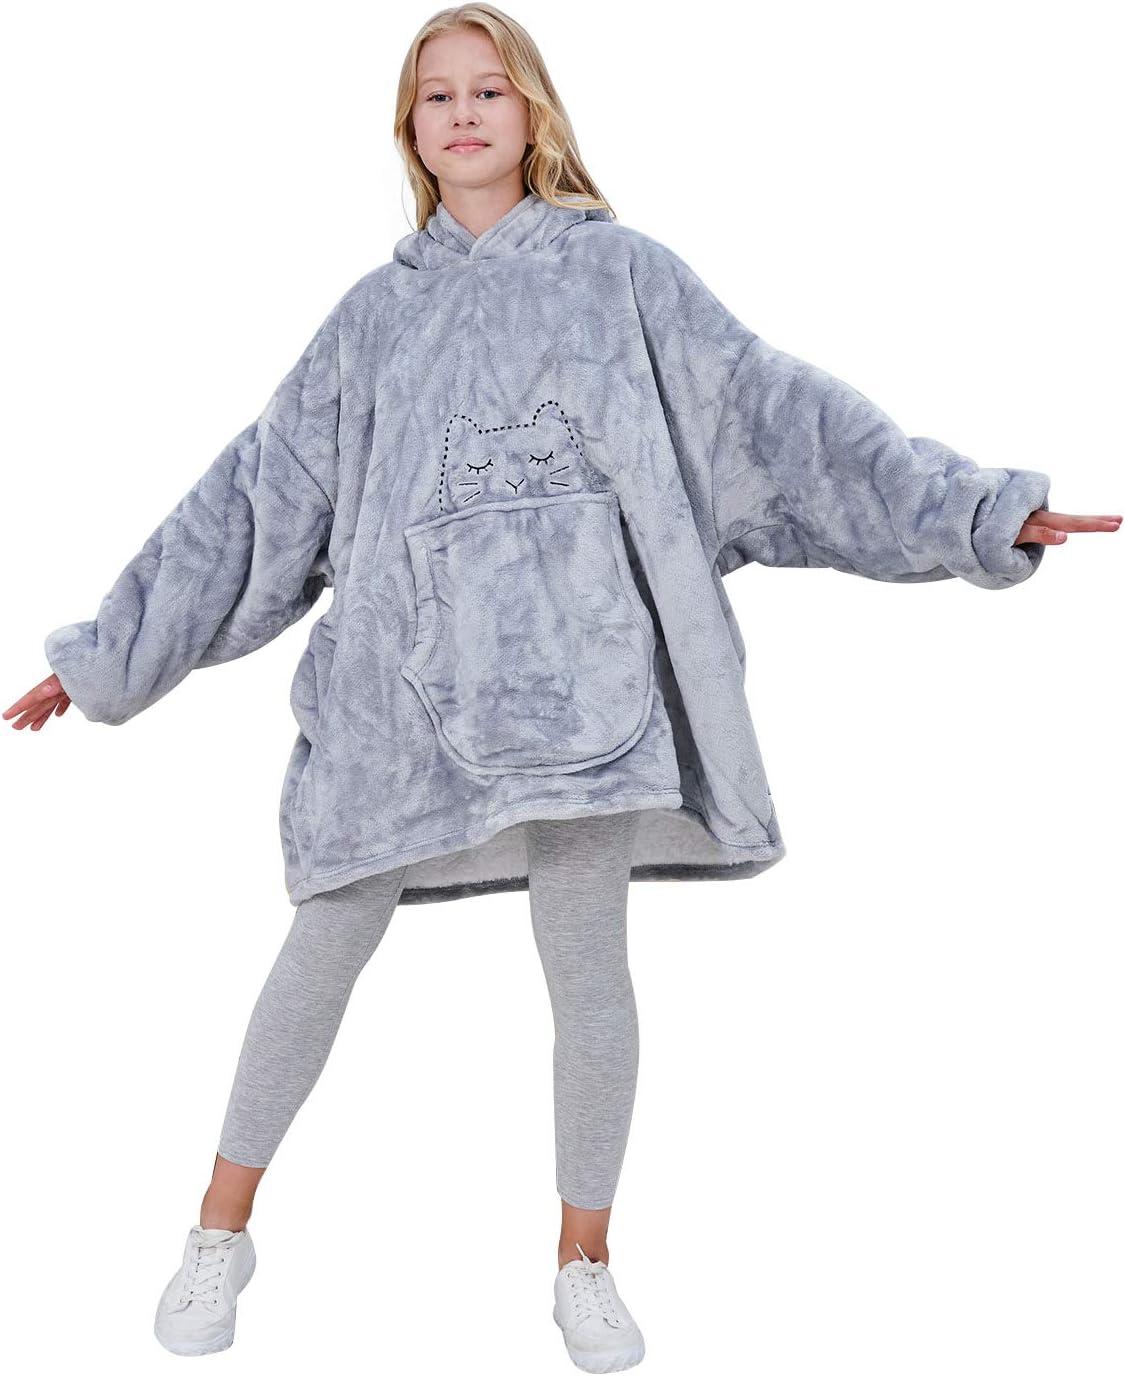 SINOGEM Sherpa Hoodie Blanket for Kids-Super Oklahoma City Mall Soft Cozy Cat Houston Mall Warm